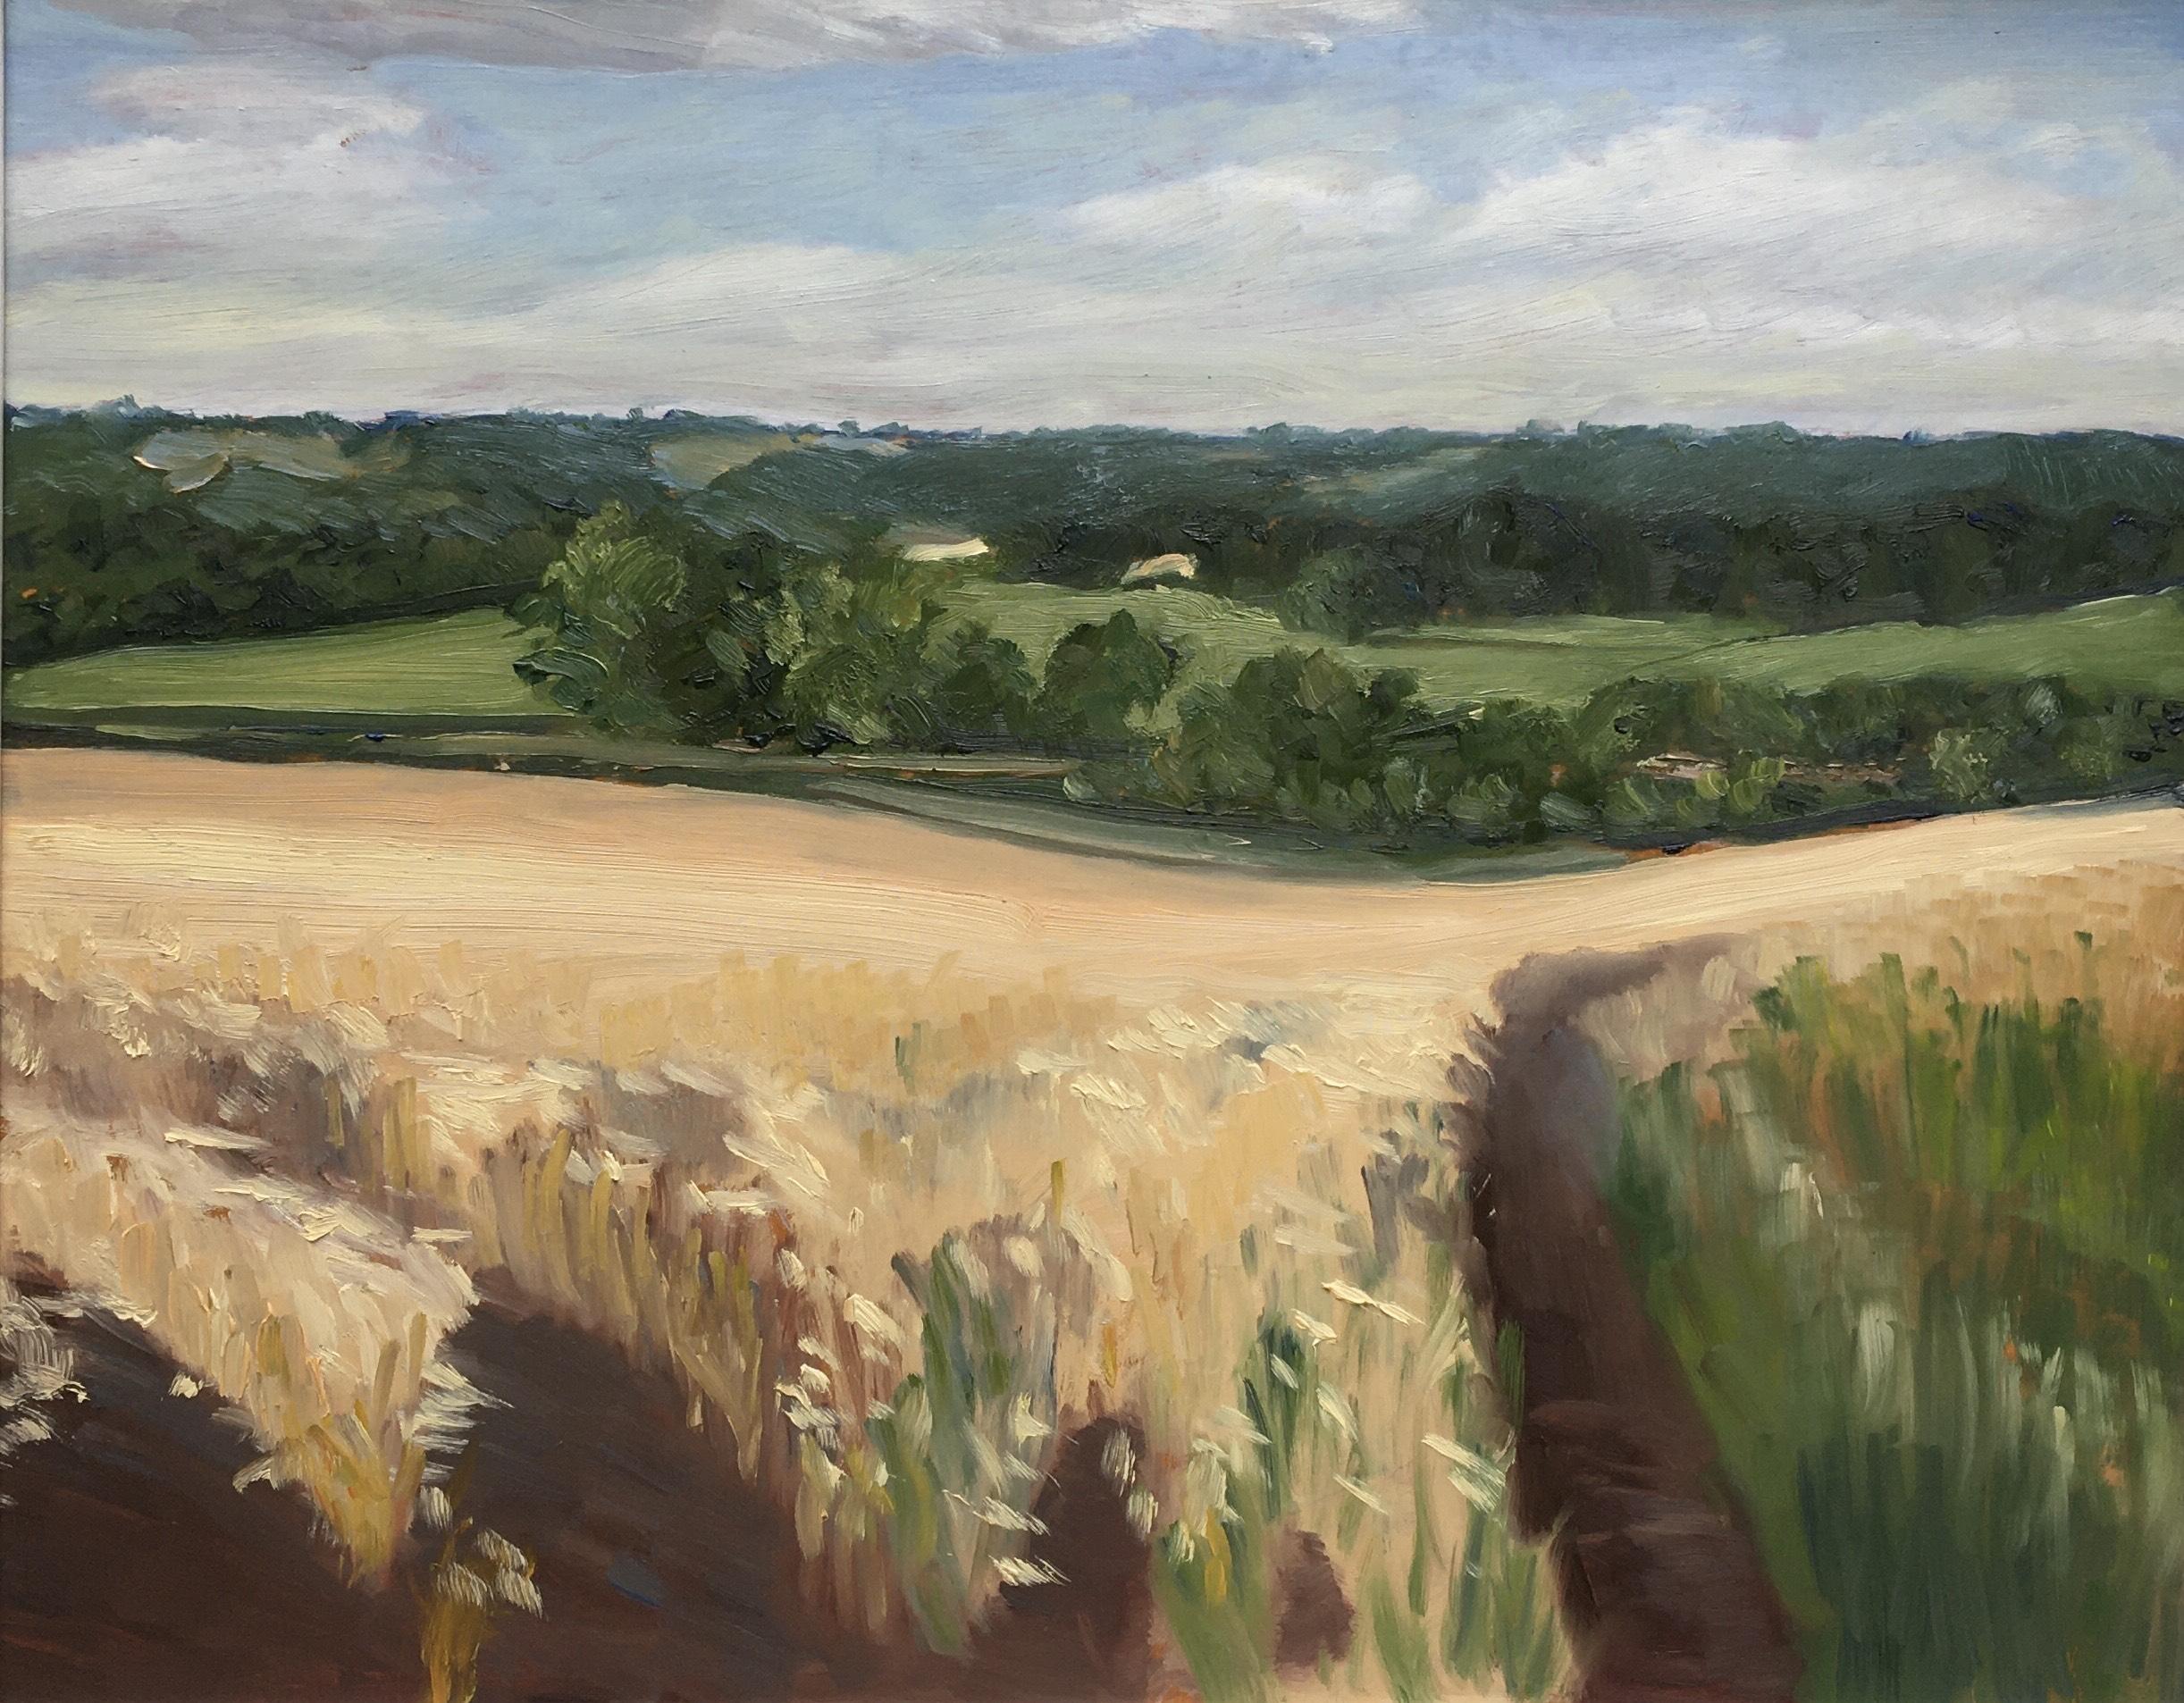 Just before the harvest, Charlbury 2020